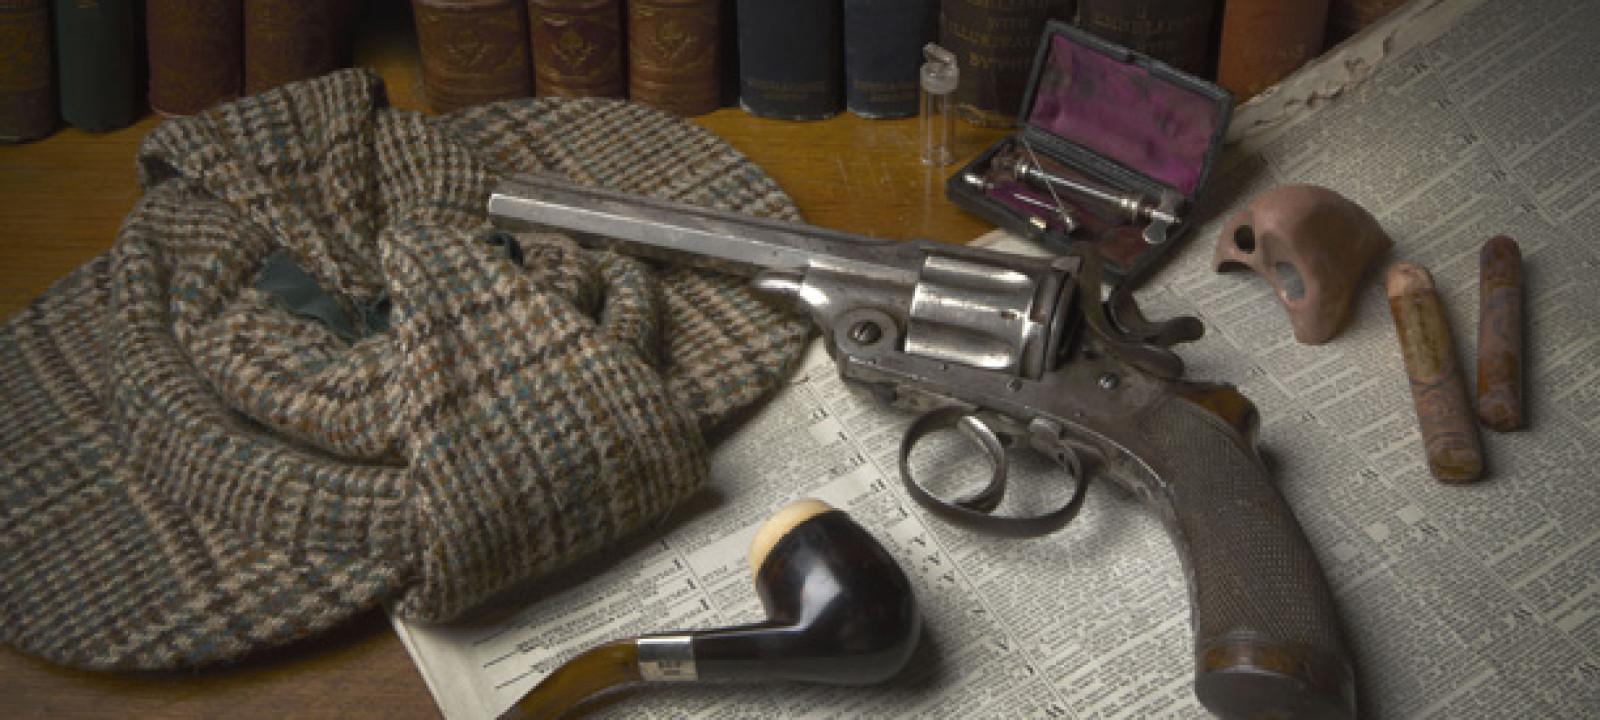 Sherlock Holmes exhibition objects